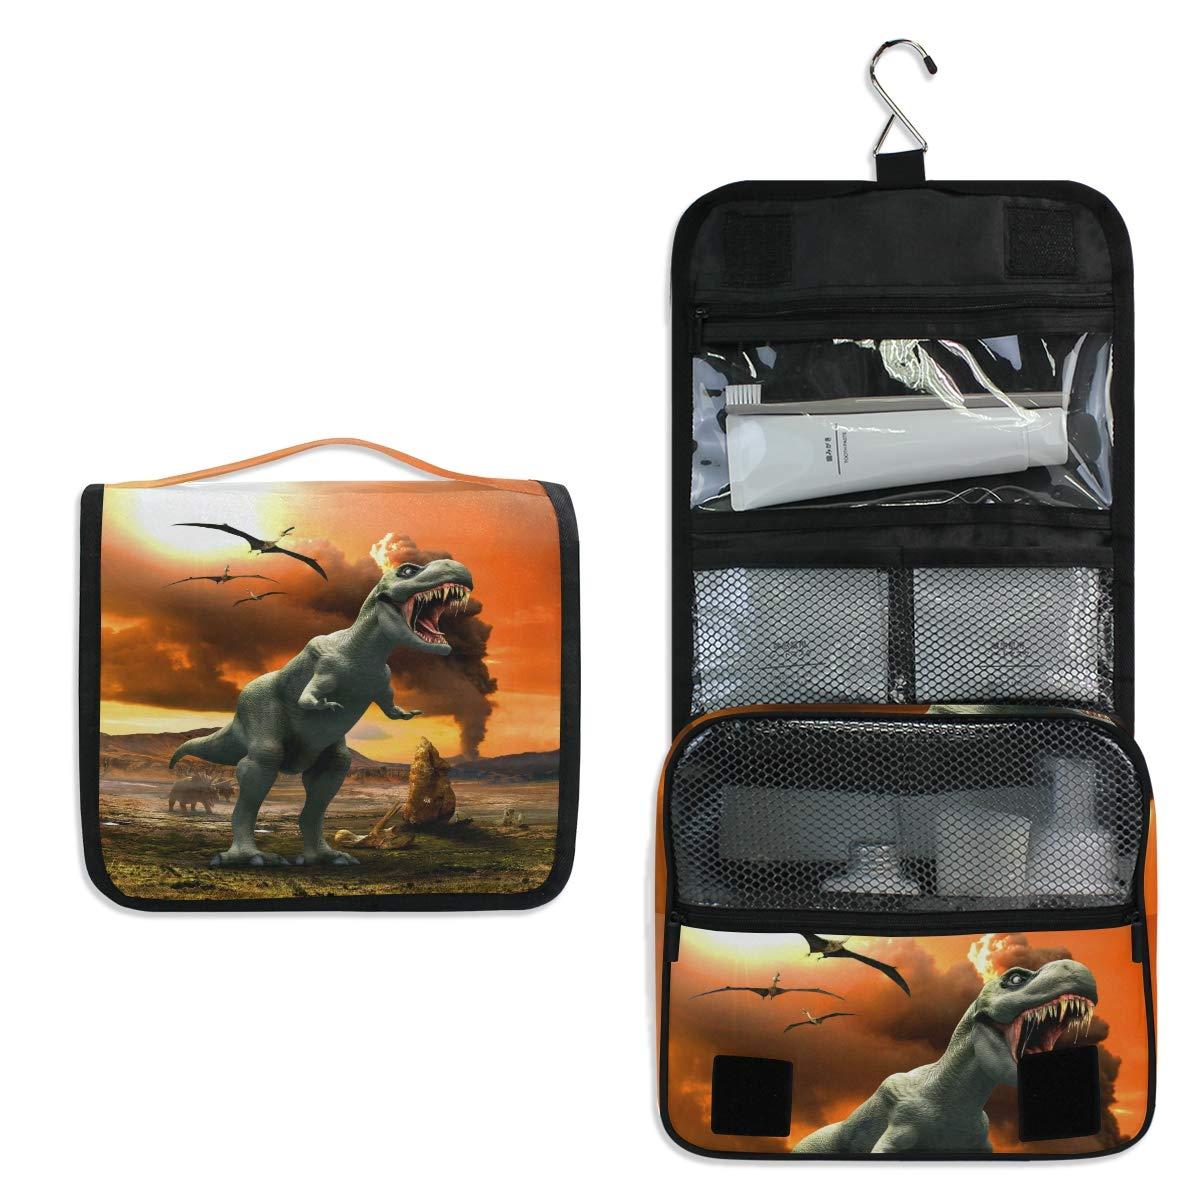 Hanging Travel Toiletry Bag - Tyrannosaurus Fierce Dinosaur Waterproof Cosmetic Bag Portable Makeup Pouch for Toiletries Bathroom